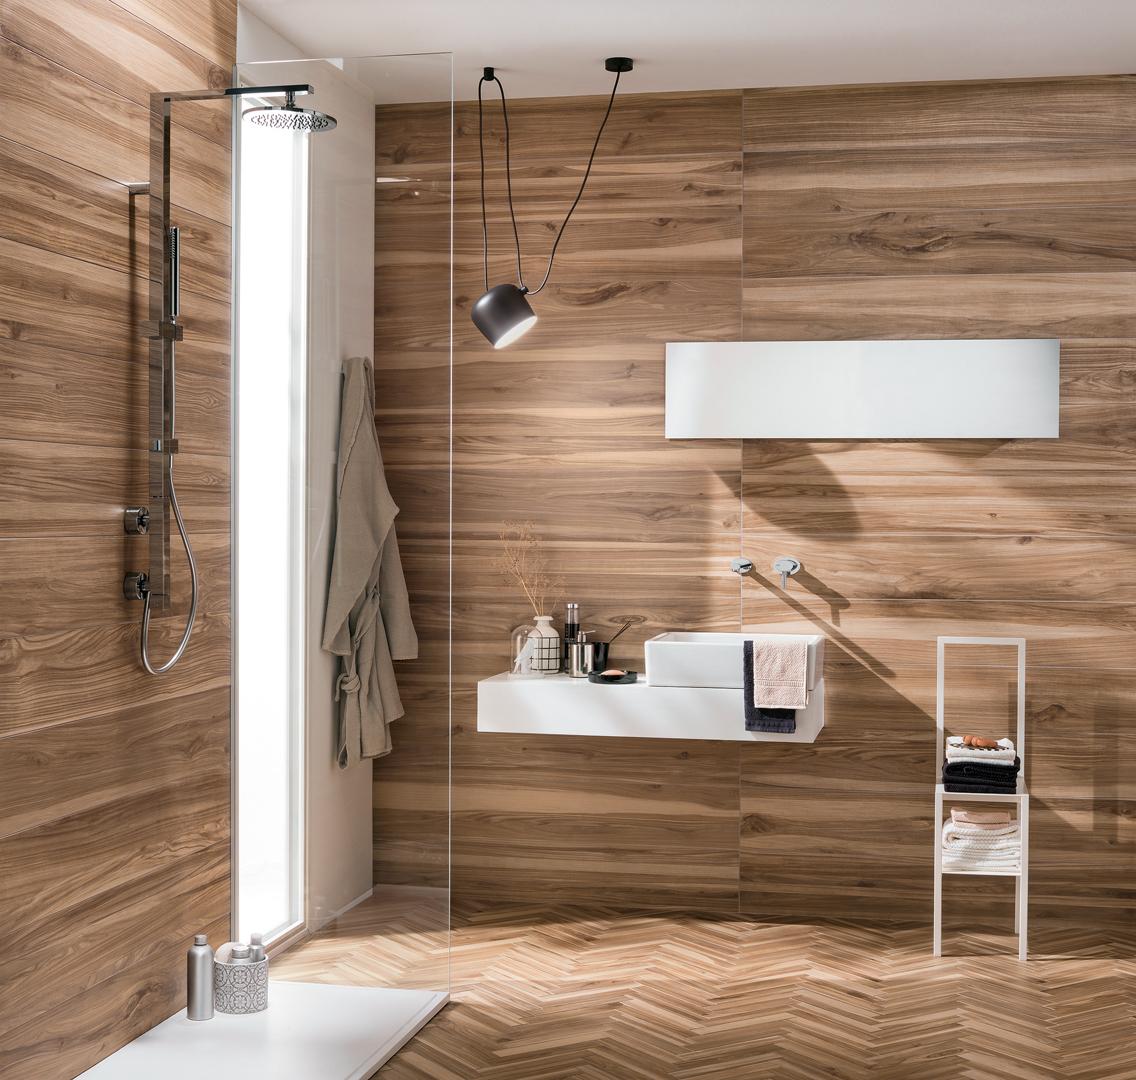 koru the types of wood of fruit trees mirage. Black Bedroom Furniture Sets. Home Design Ideas